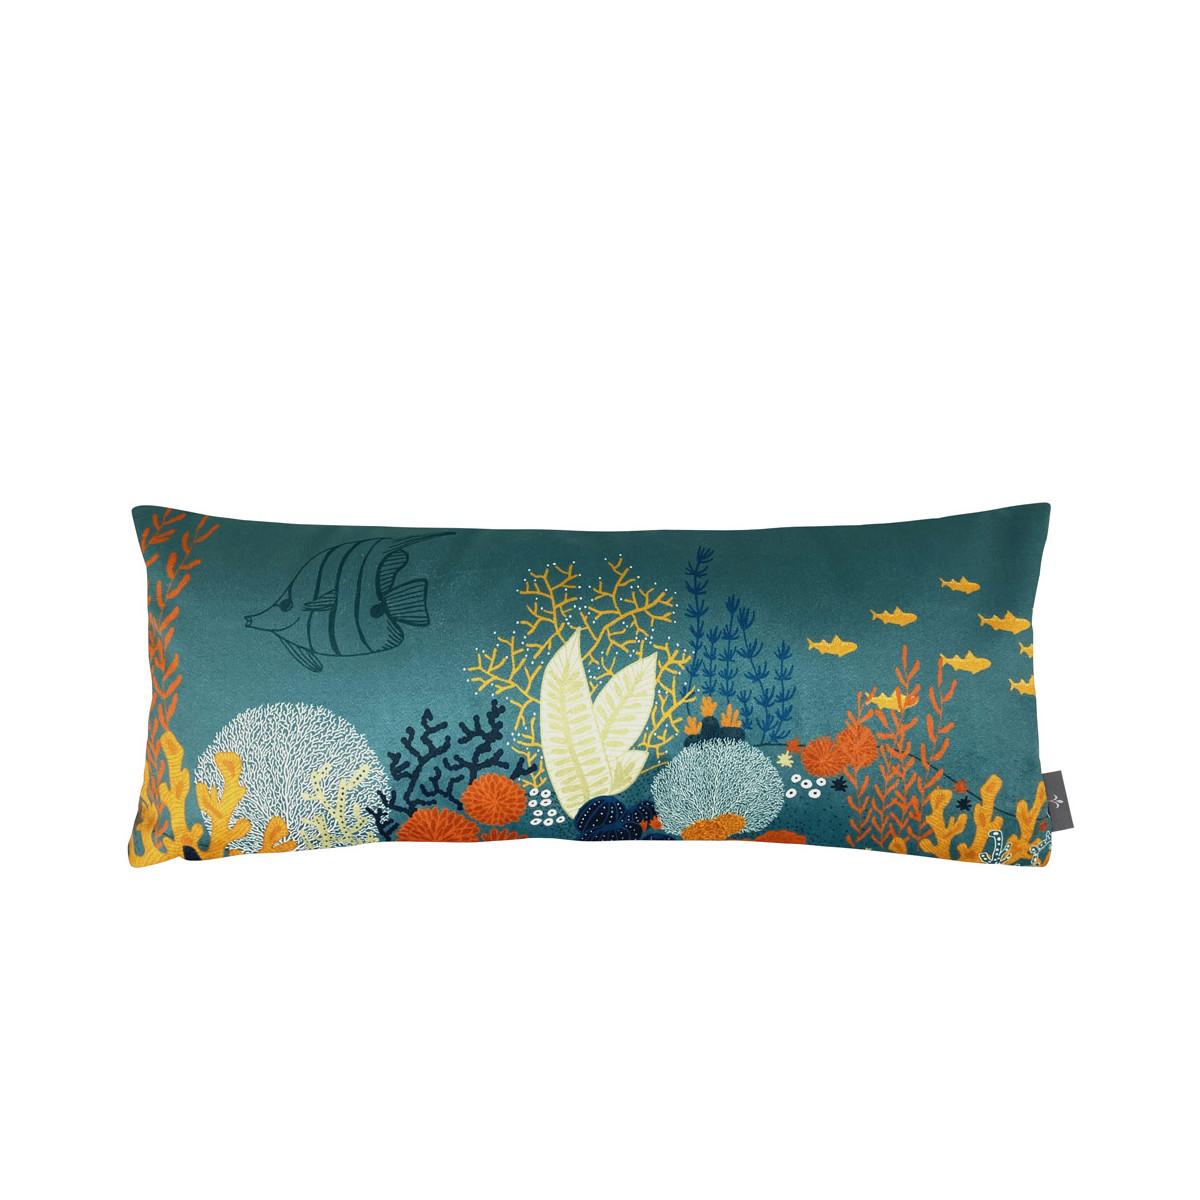 Coussin imprimé la jungle marine bleu 25x60